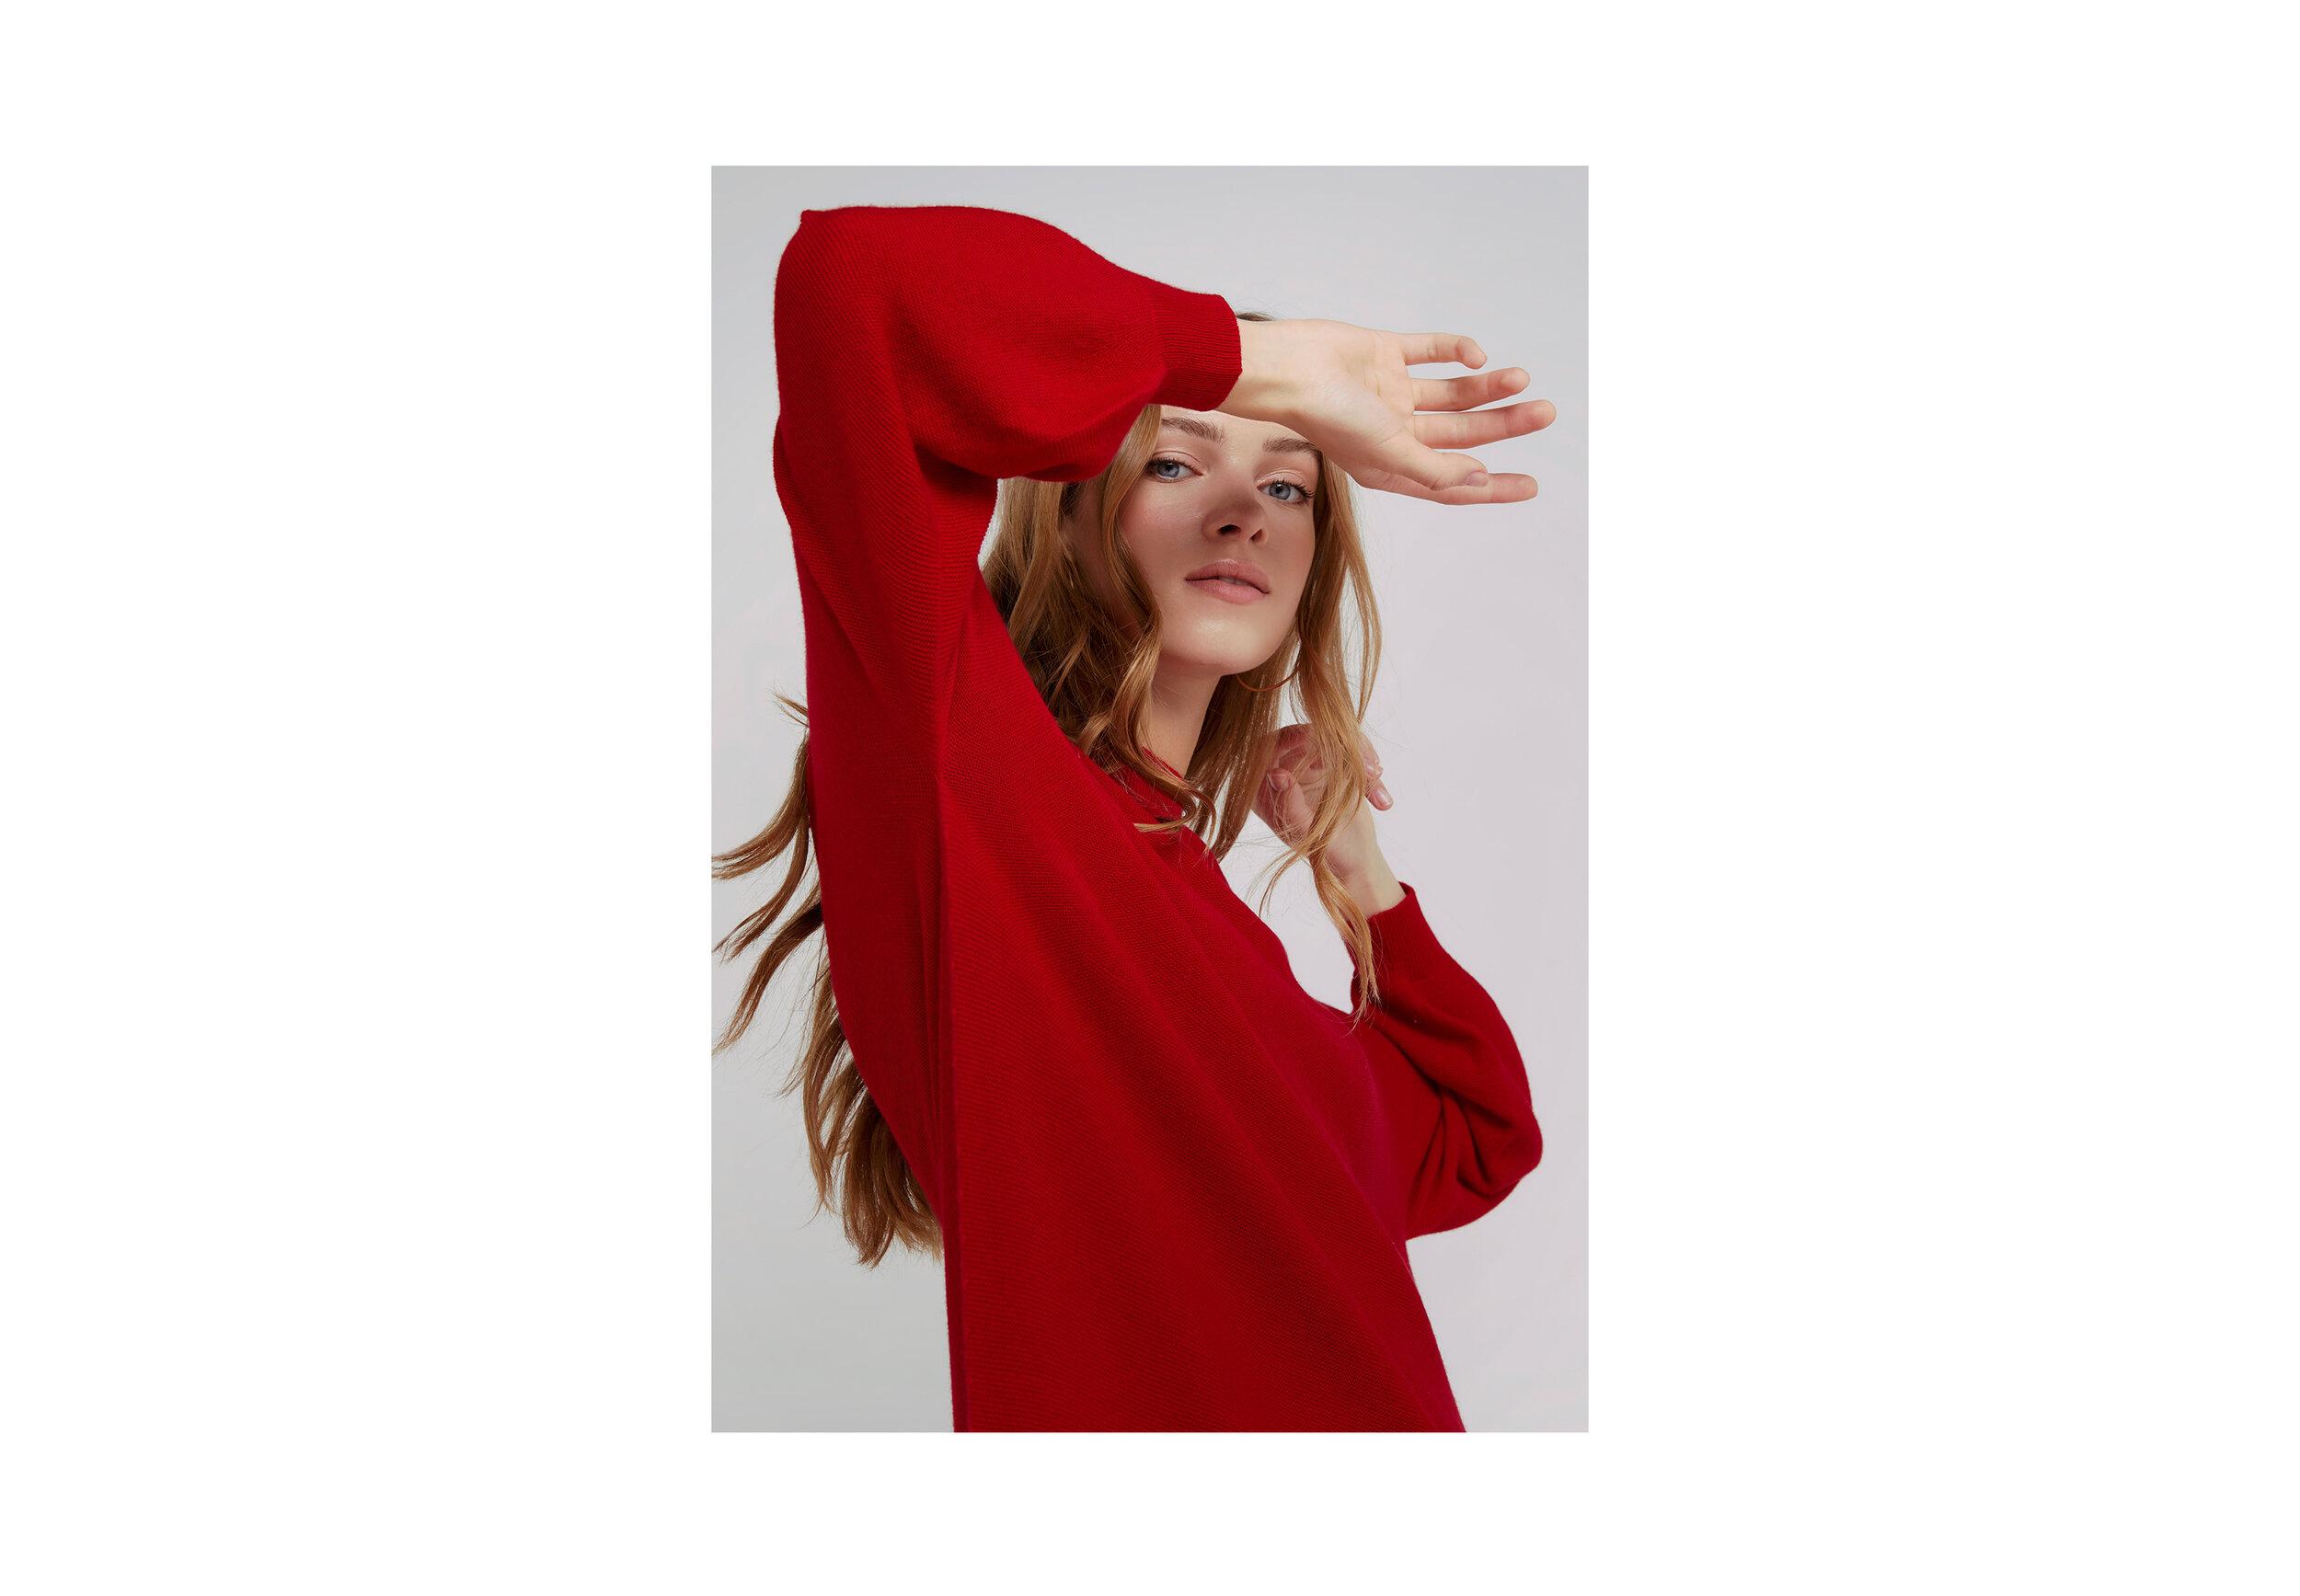 Ieva-Rainyte-Zalando-Fashion-Matthew-Coleman-Photography-1.jpg